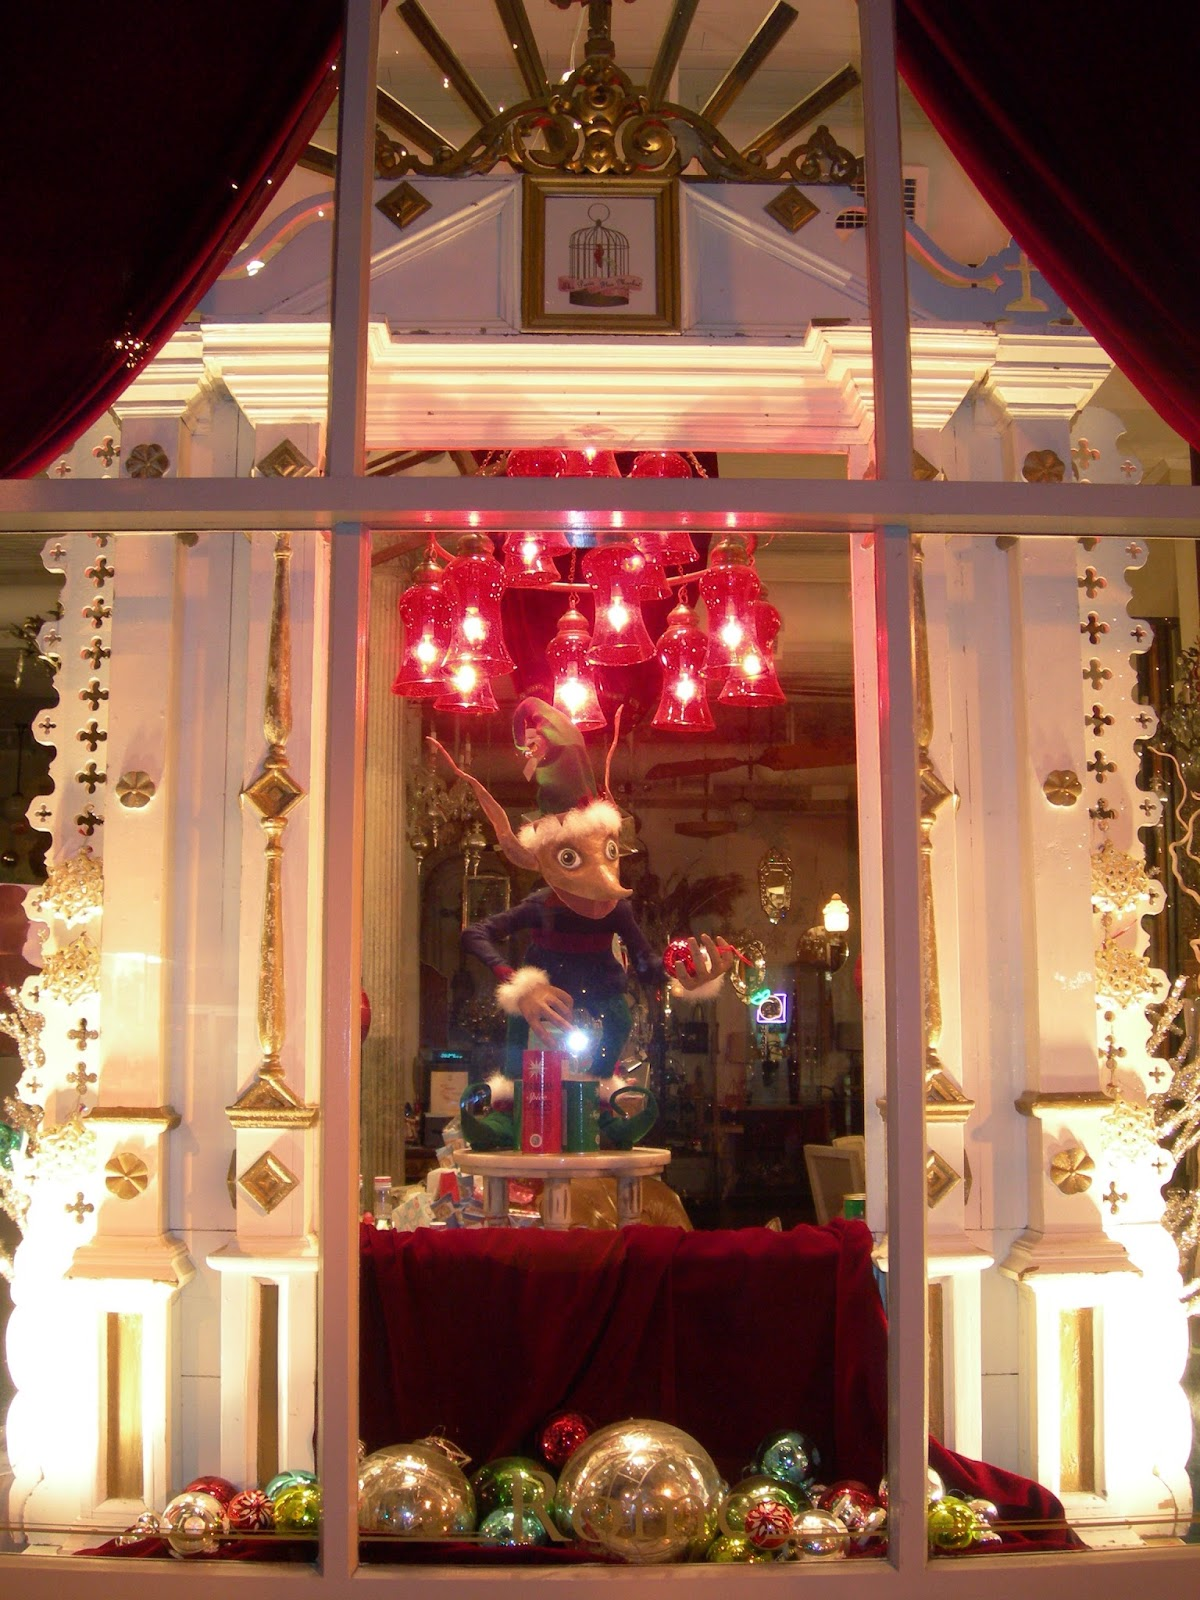 2014 Southern Christmas Travel Tips from Romance Inns in Savannah Georgia USA